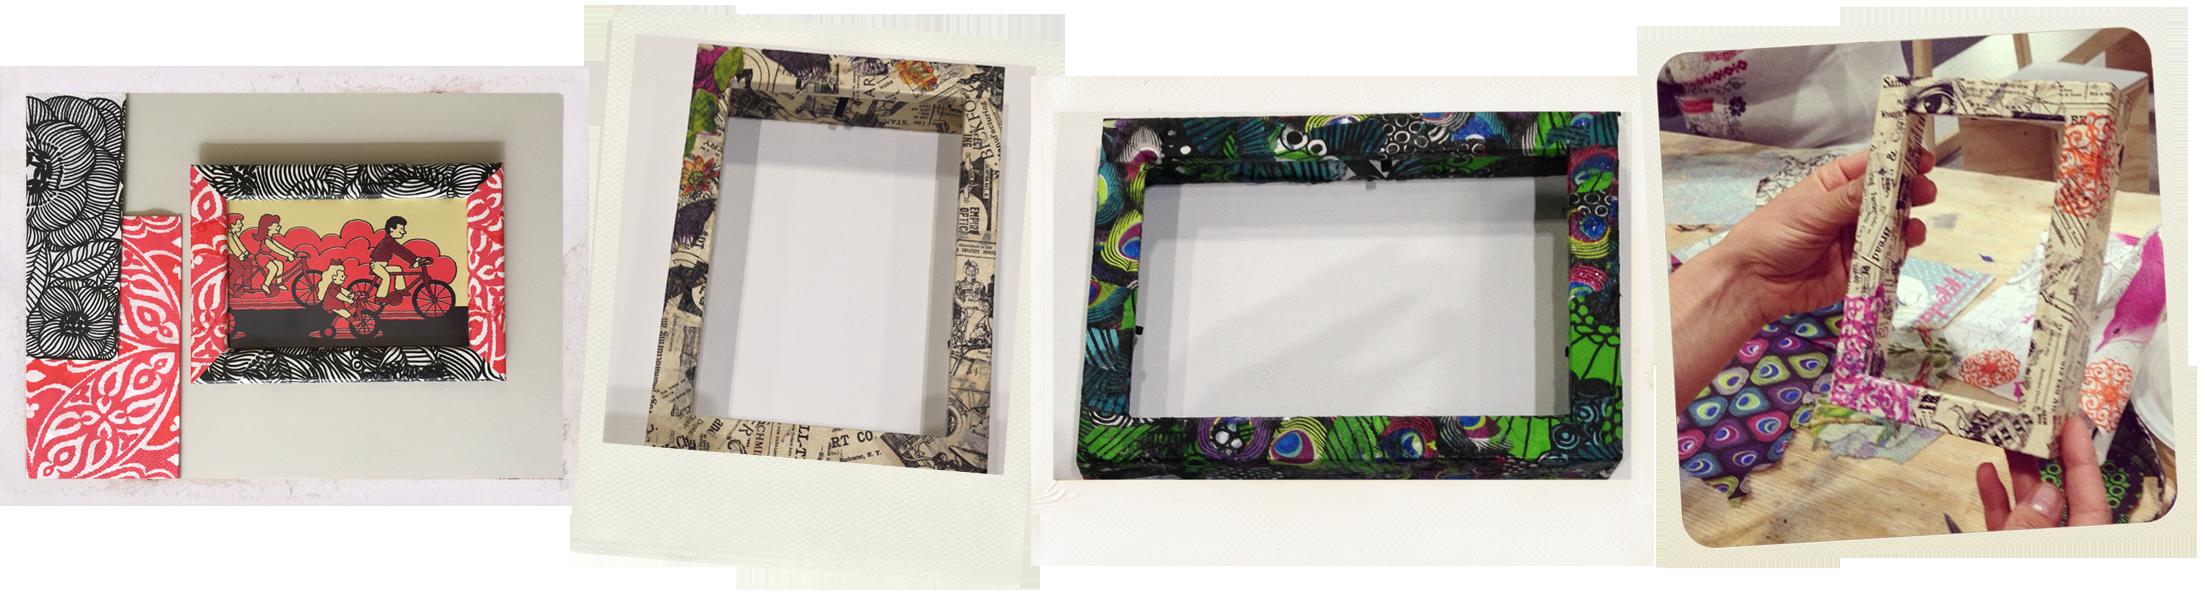 Introduction to decoupage gabriela szulman art decoupage photo frames jeuxipadfo Image collections